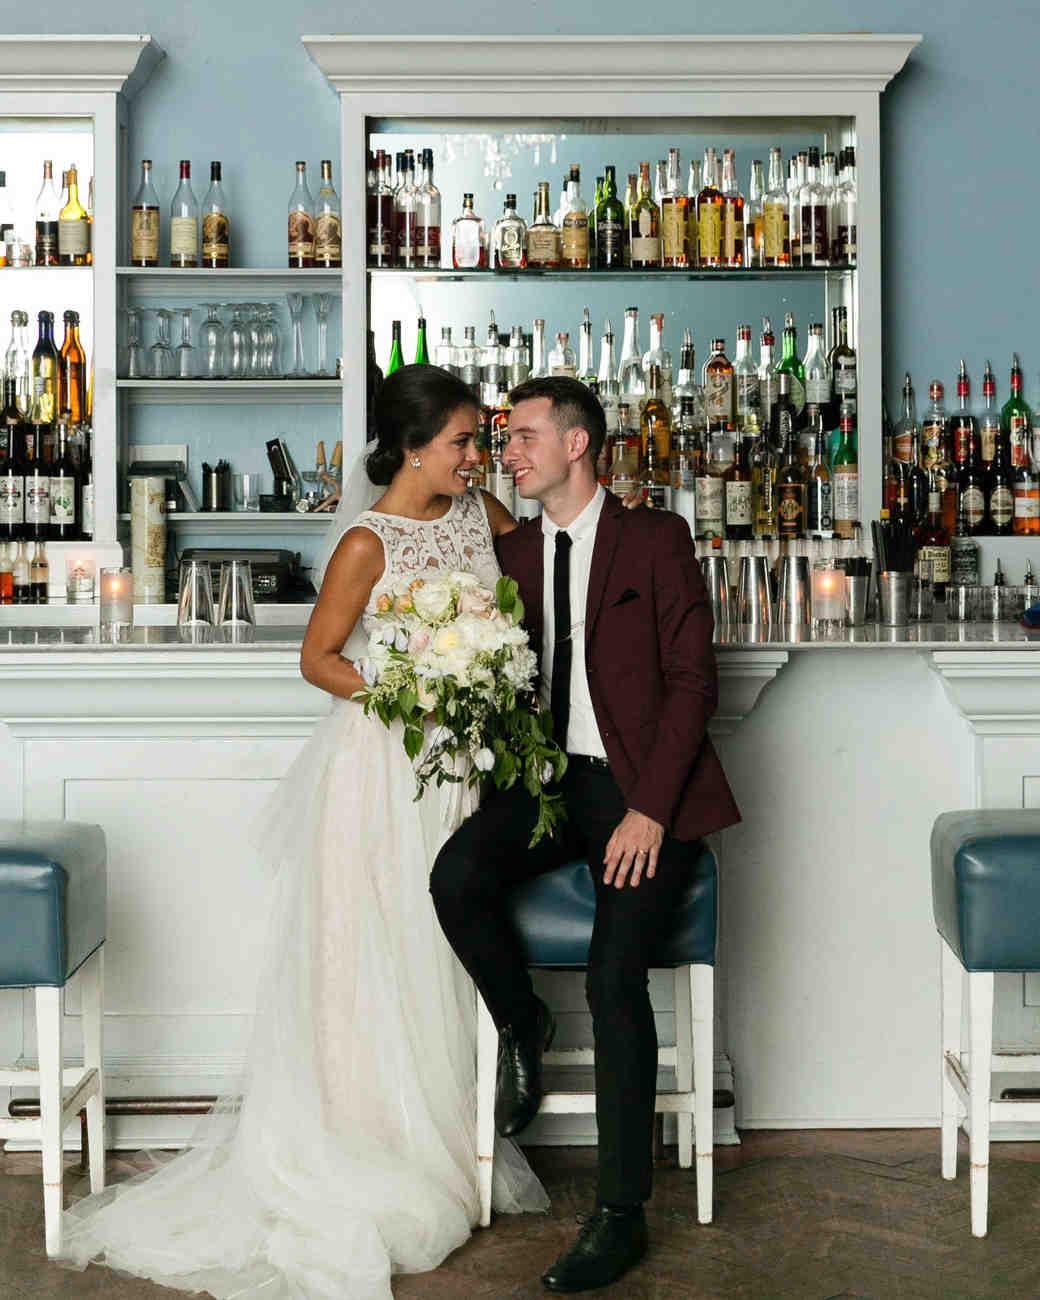 bianca-bryen-wedding-couple-395-s112509-0216.jpg